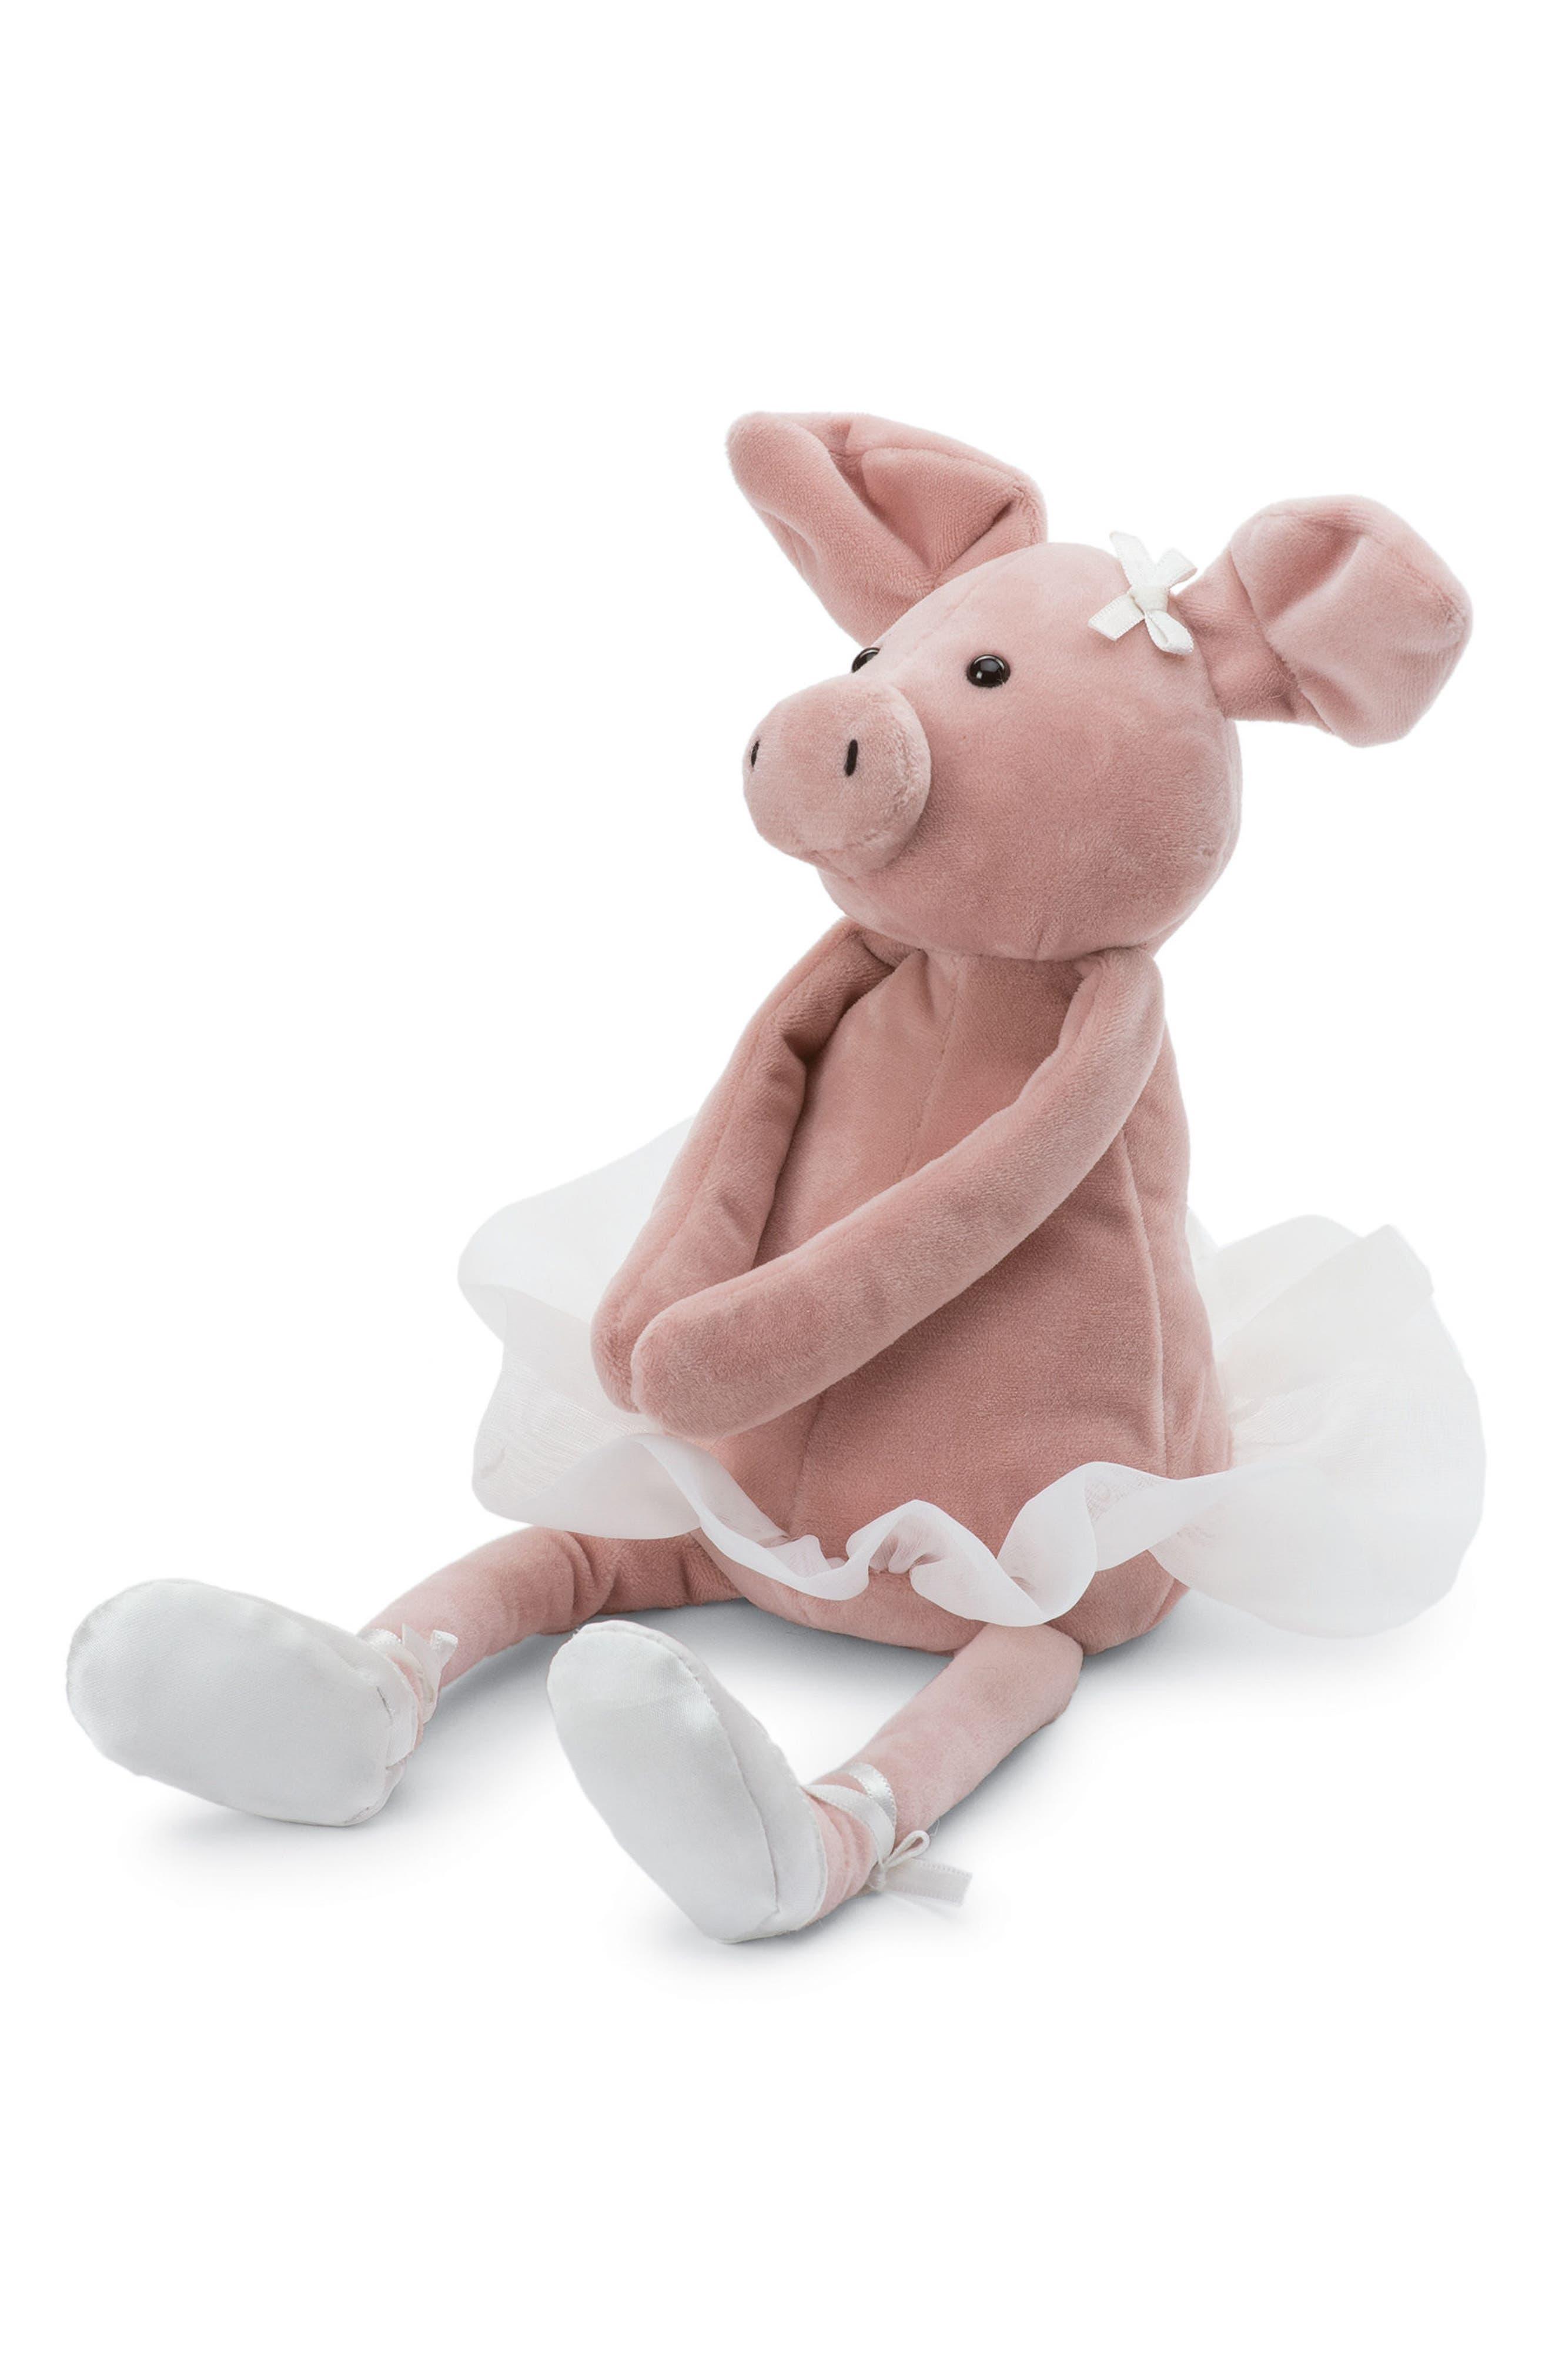 Dancing Darcey Piglet Stuffed Animal,                             Main thumbnail 1, color,                             680